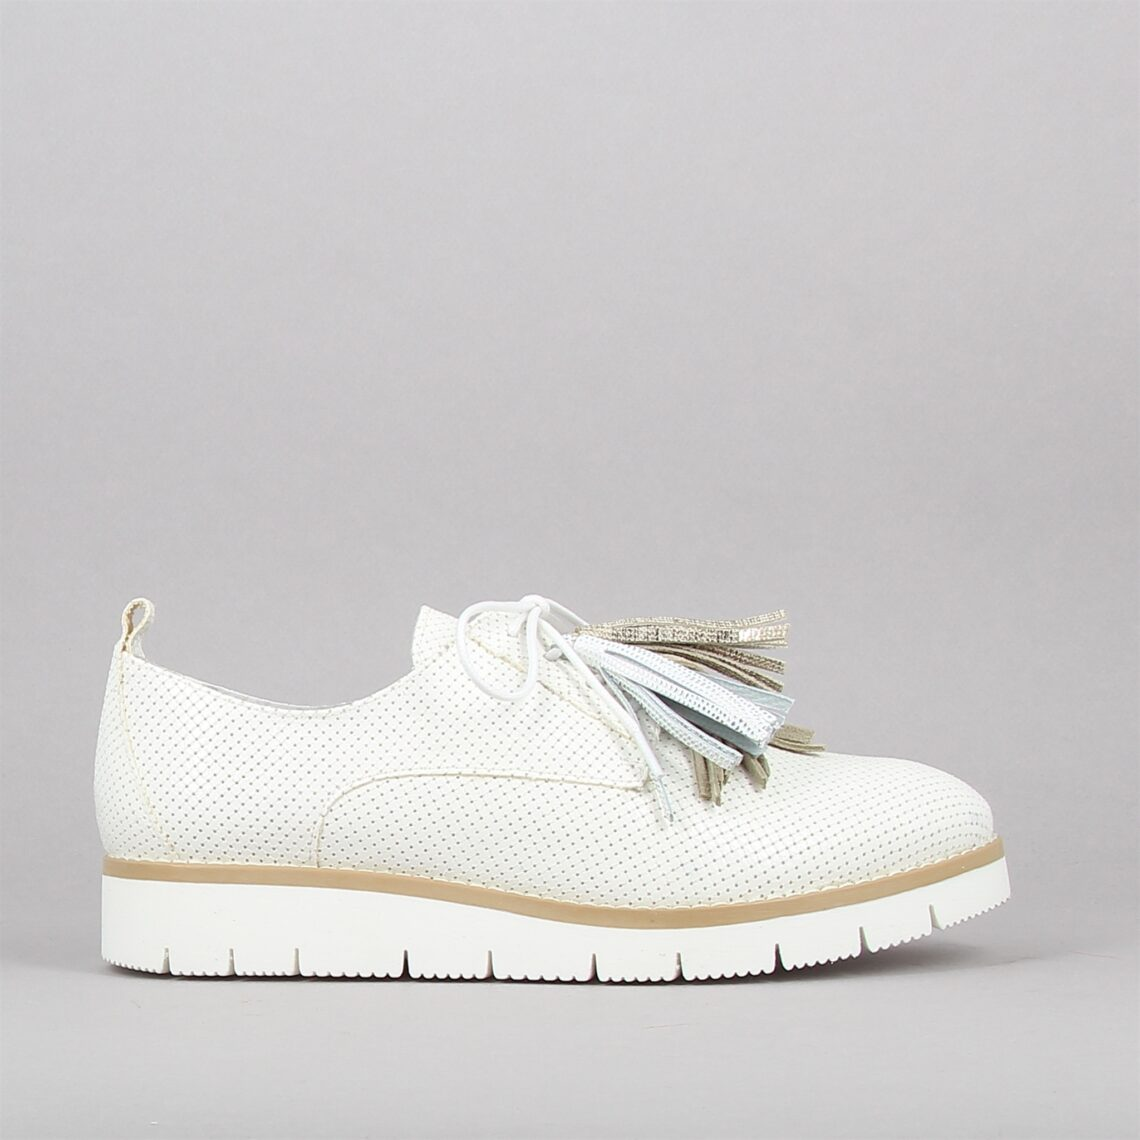 armoise-19-blanc-172326914-0.jpg